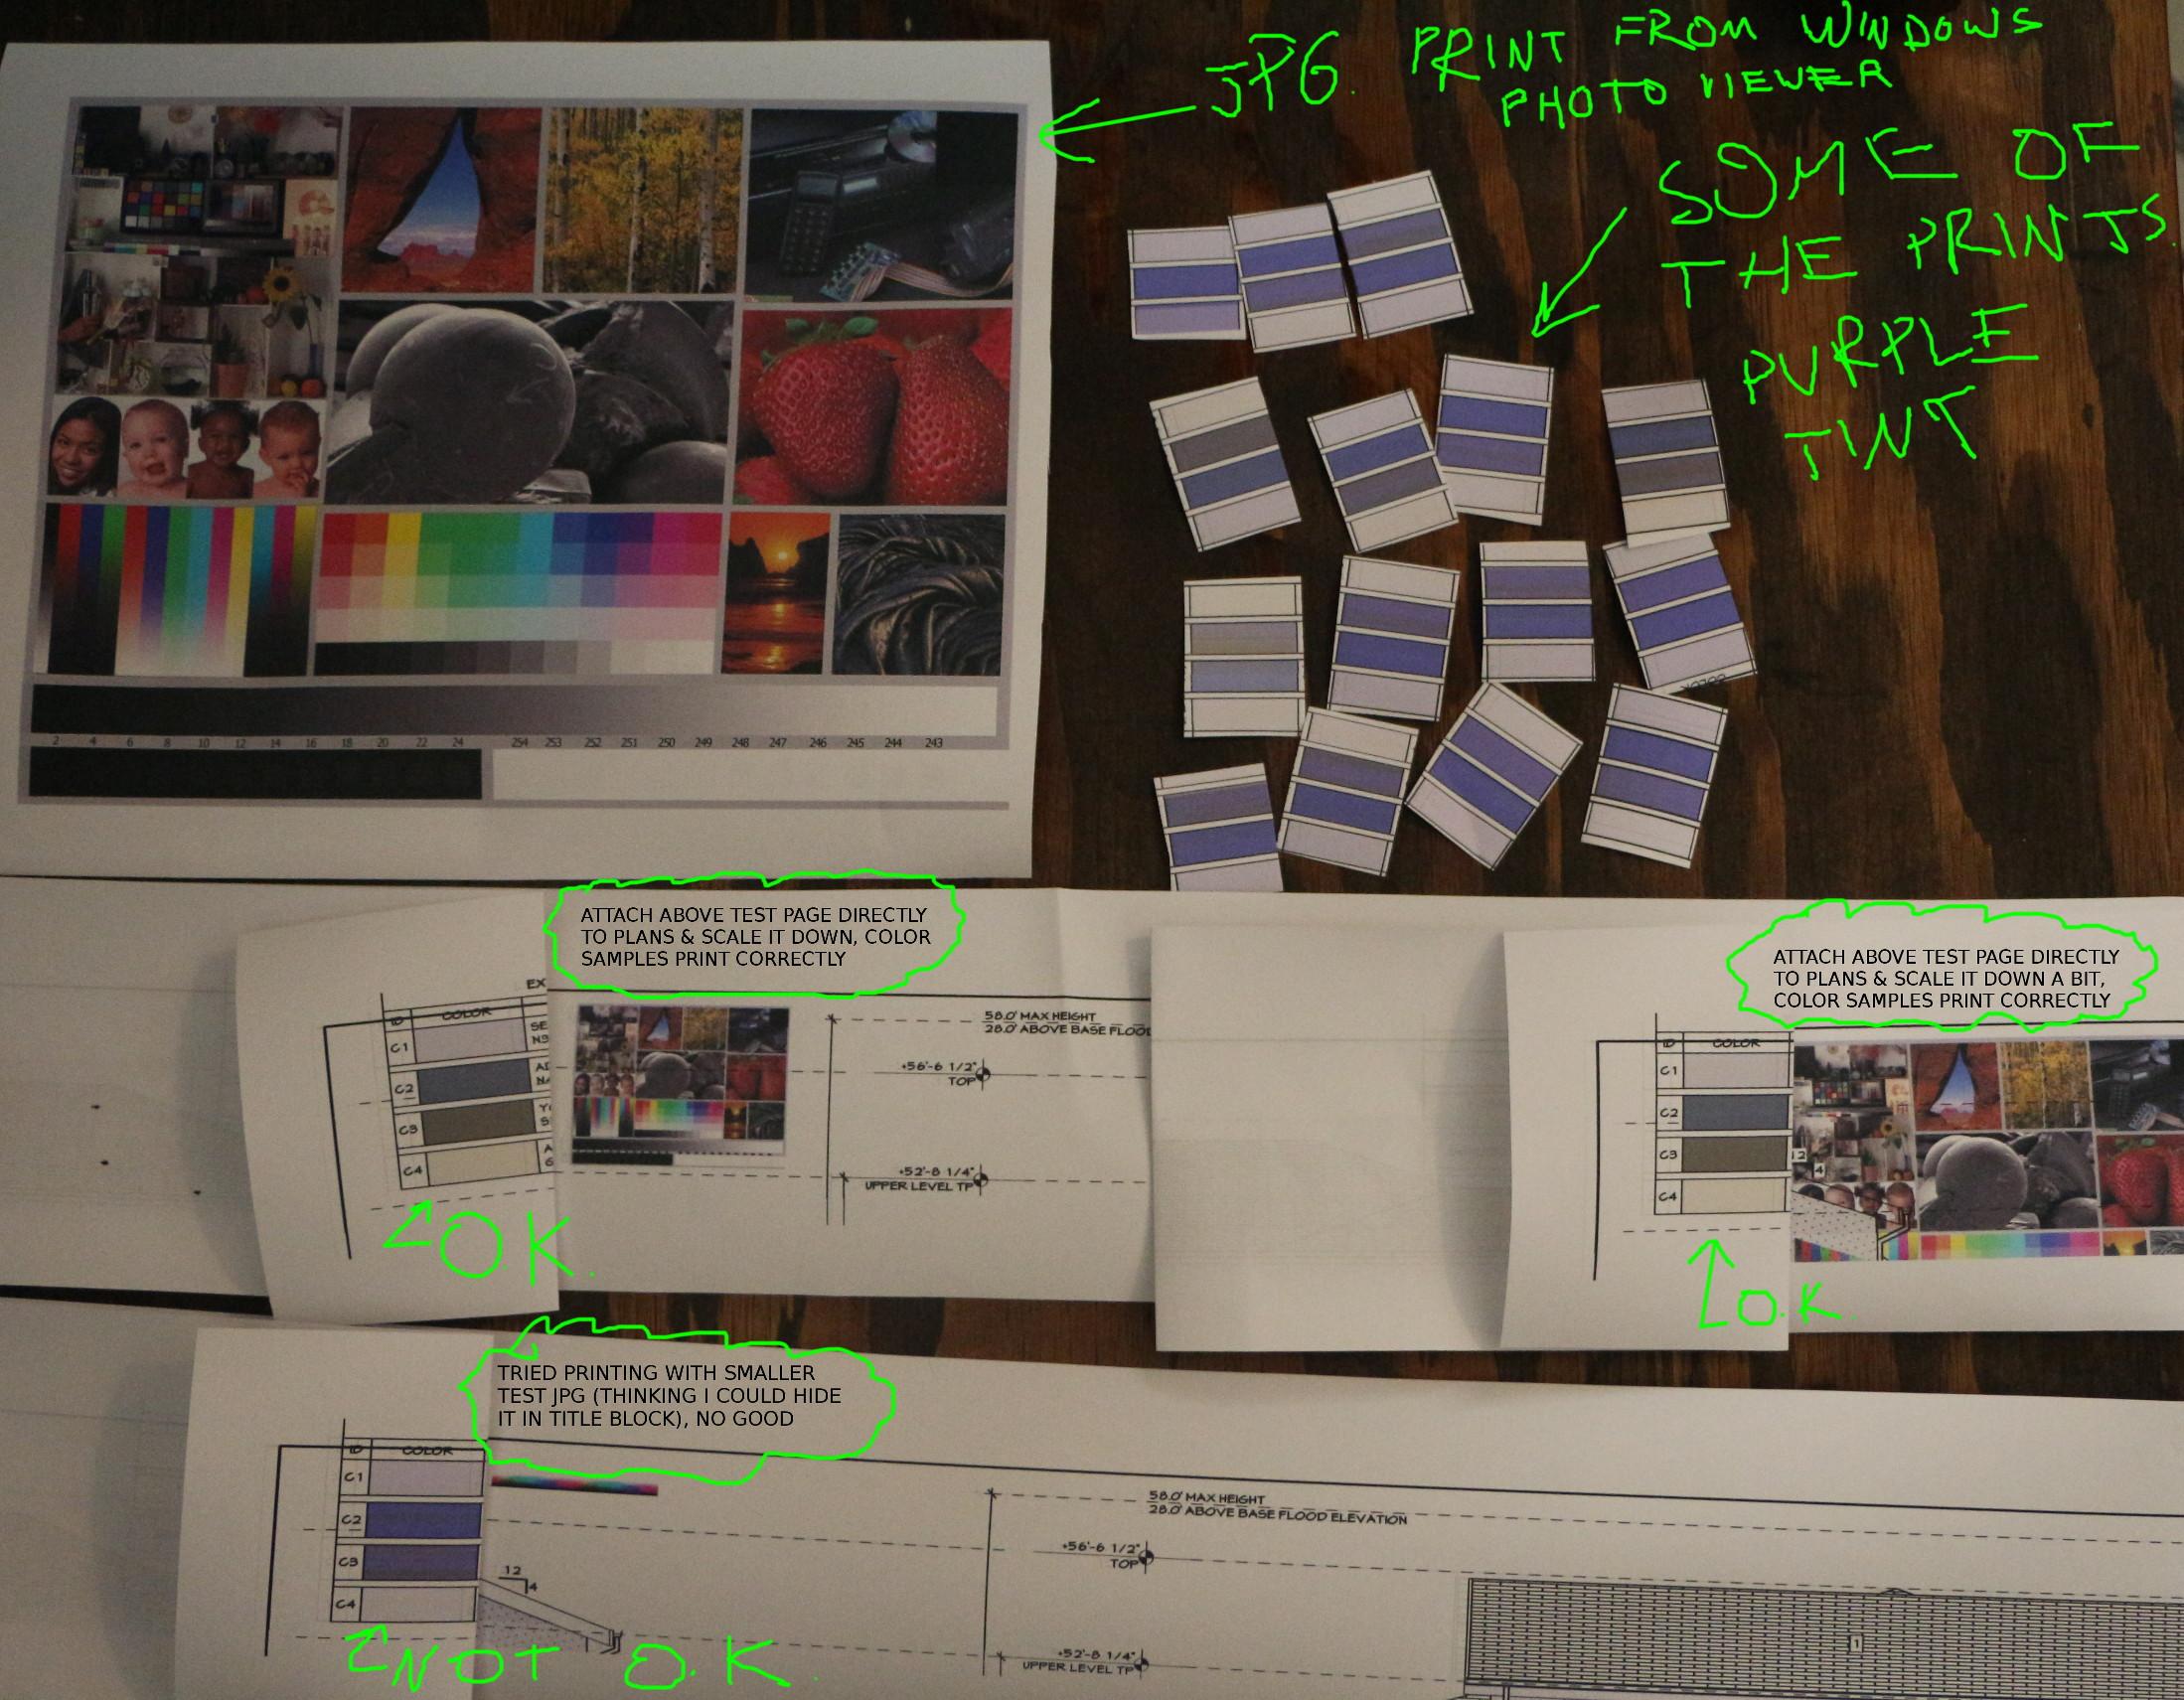 Image Result For Hp Color Plotter Test Page Samples